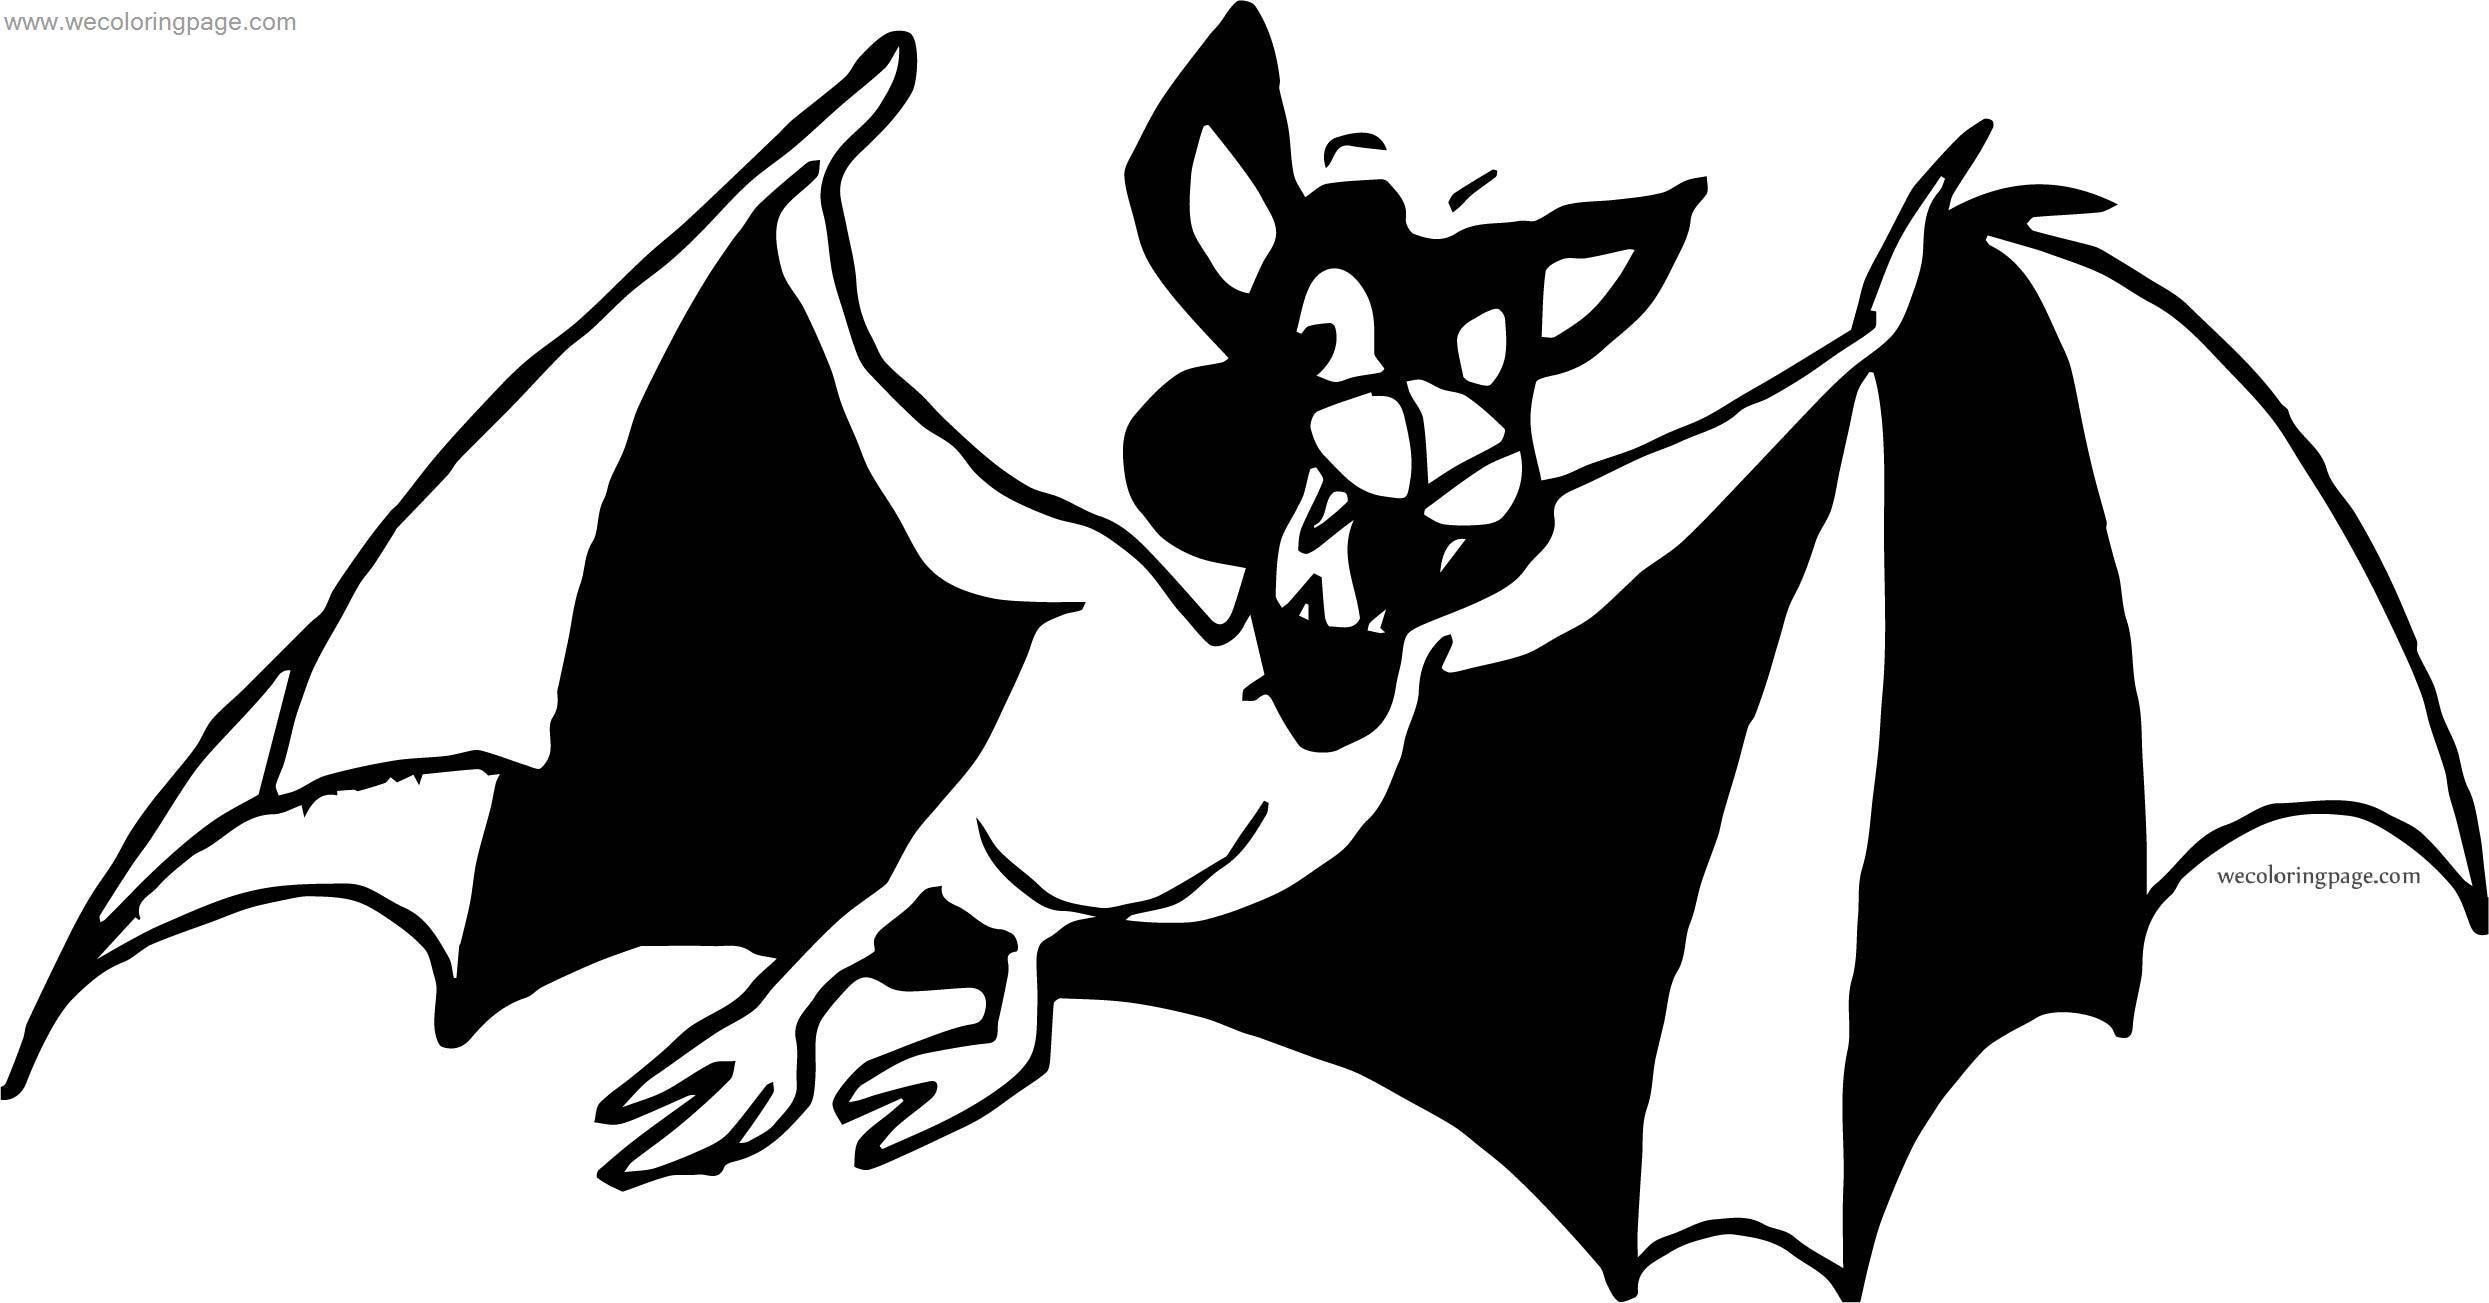 When Bat Coloring Page